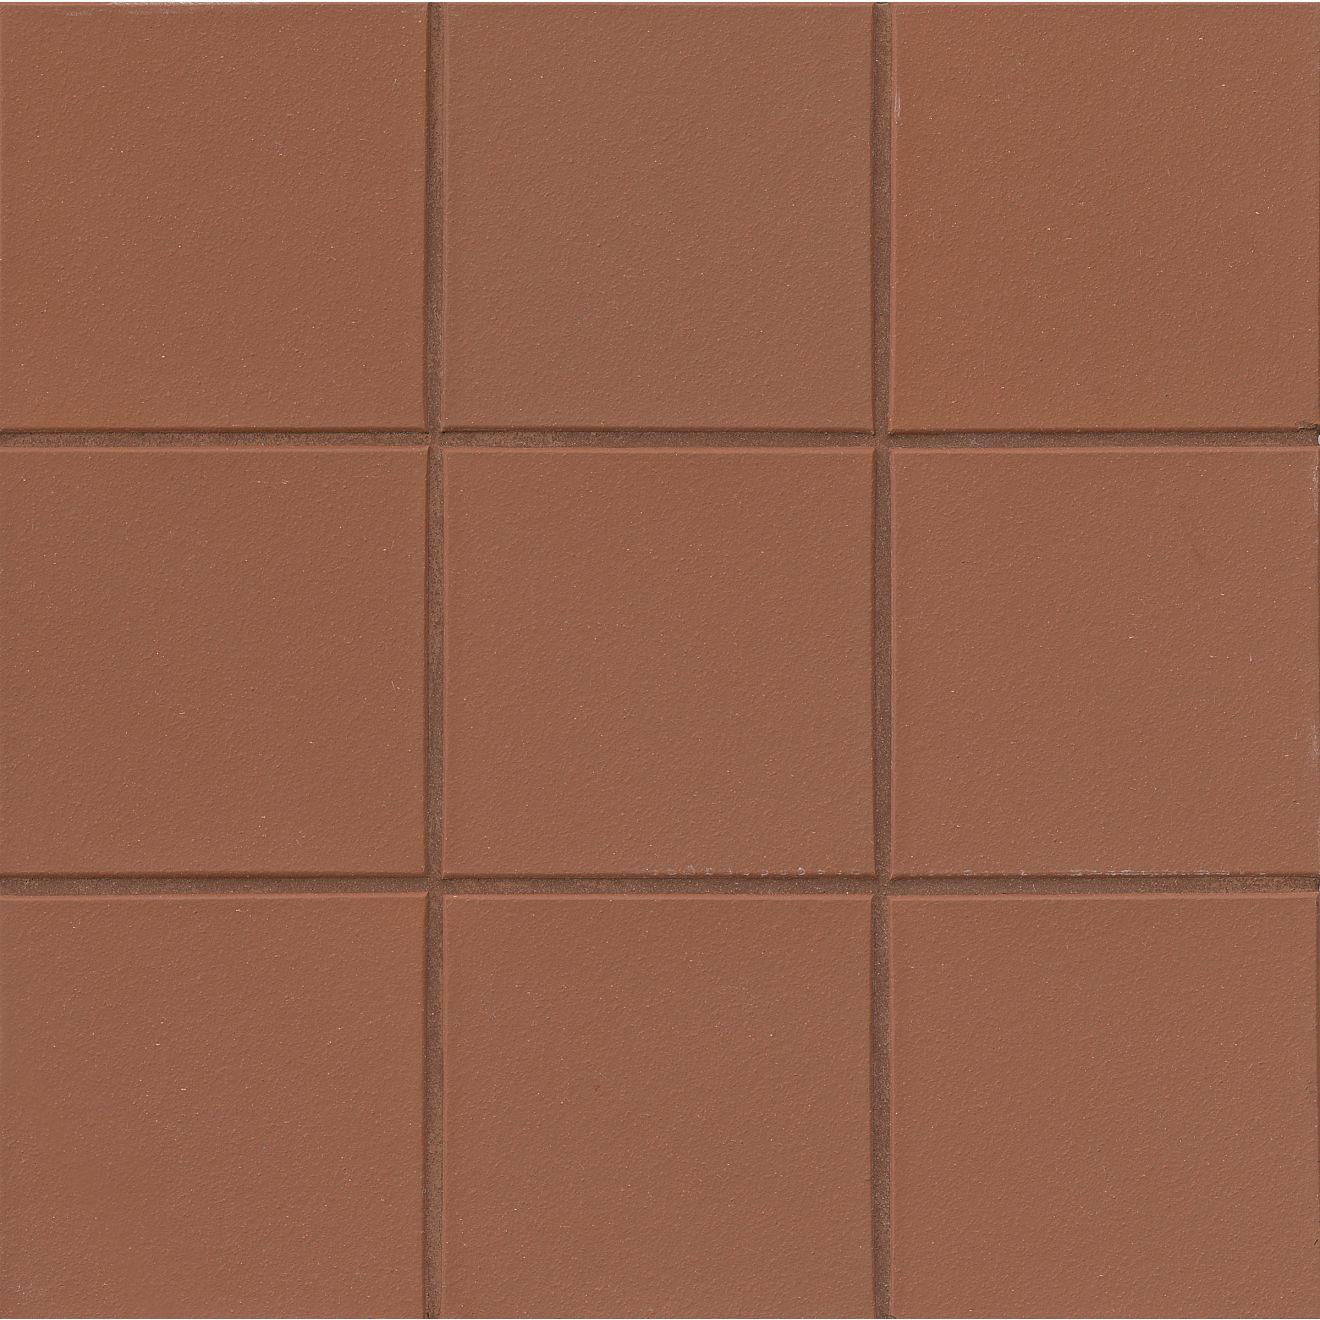 "Metropolitan 6"" x 6"" Floor & Wall Tile in Mayflower Red"